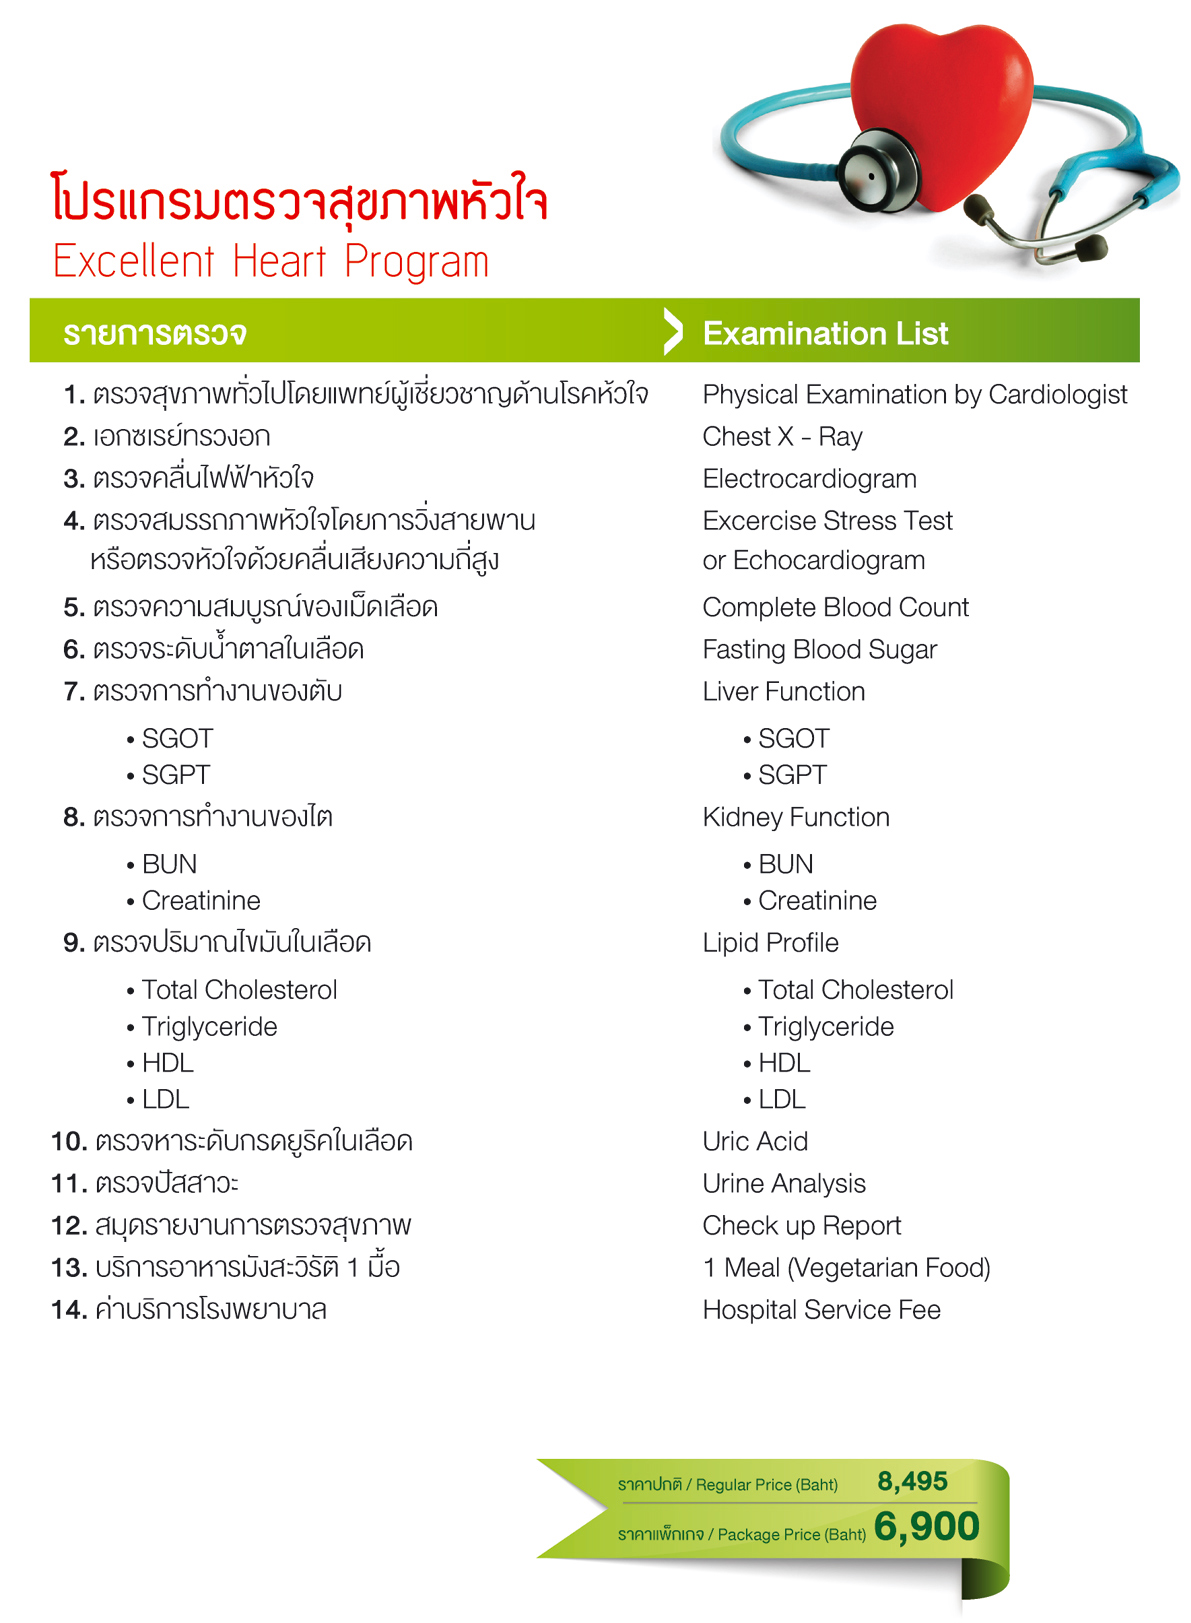 Excellent-Heart-Program